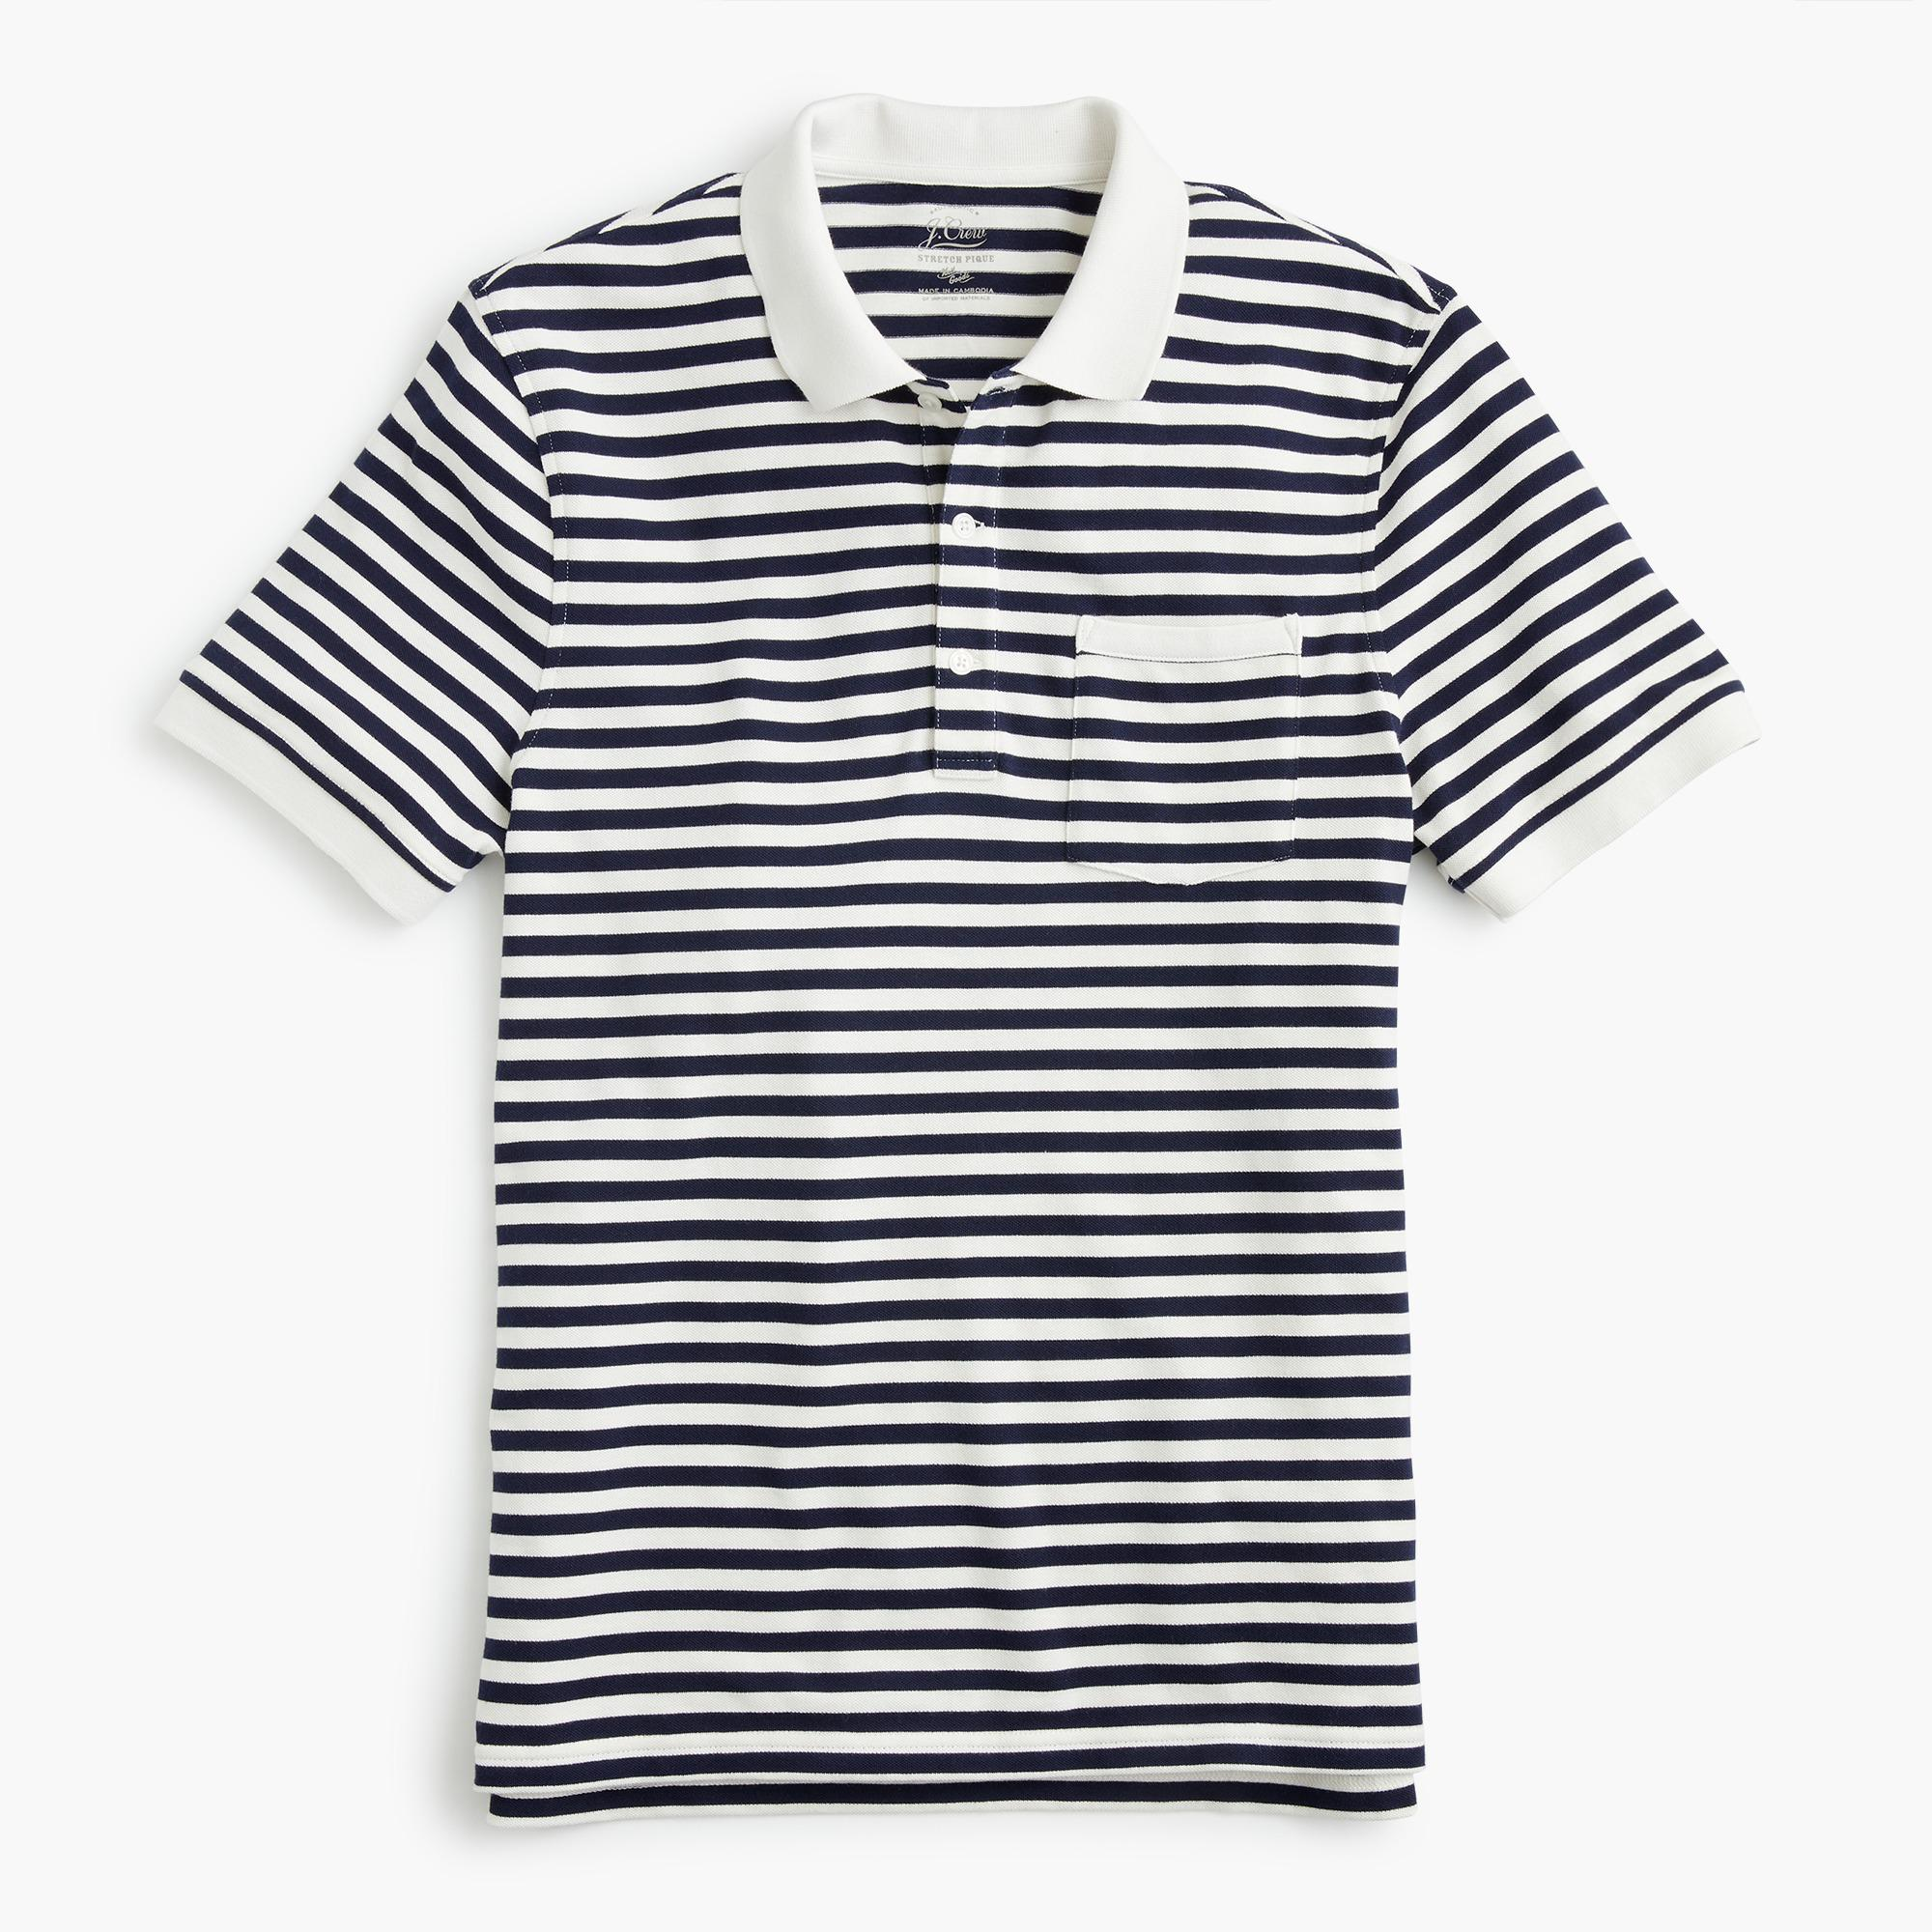 J.Crew Stretch Piqué Polo Shirt In Stripe in Ivory (White) for Men